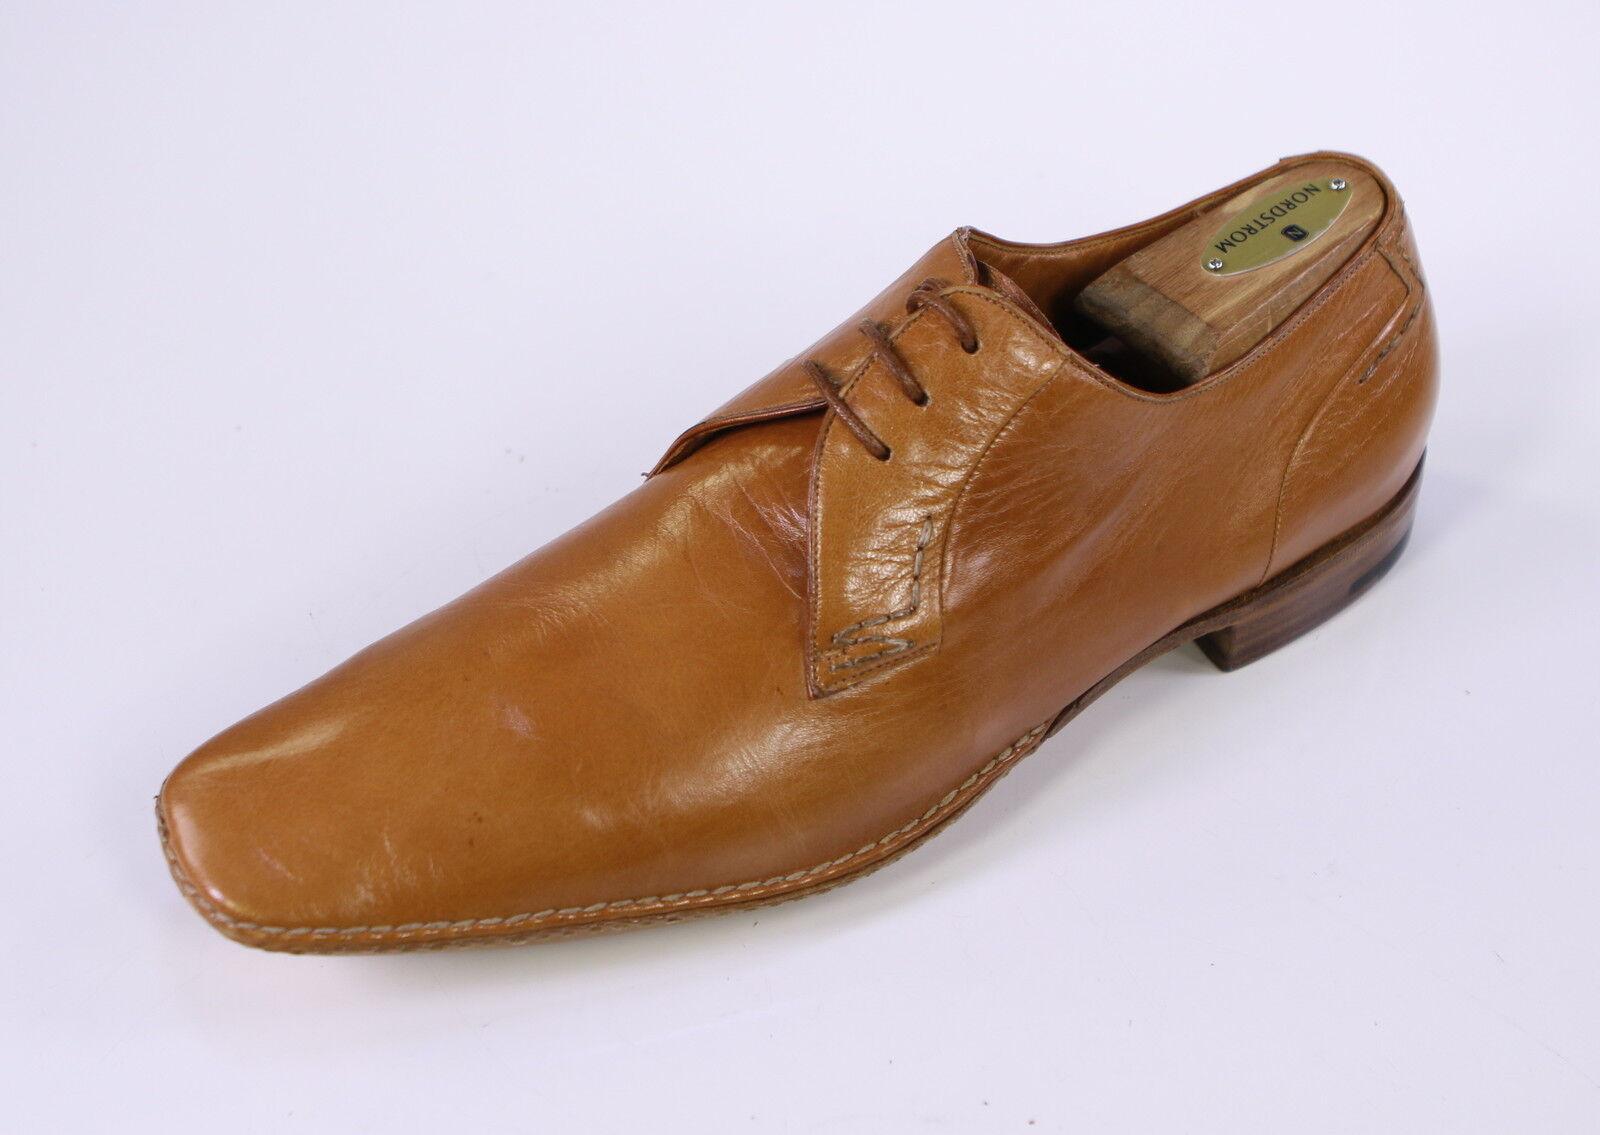 NIB New New New SILVANO LATTANZI Caramel Brown Leather Oxford Dress shoes US 9 d99781